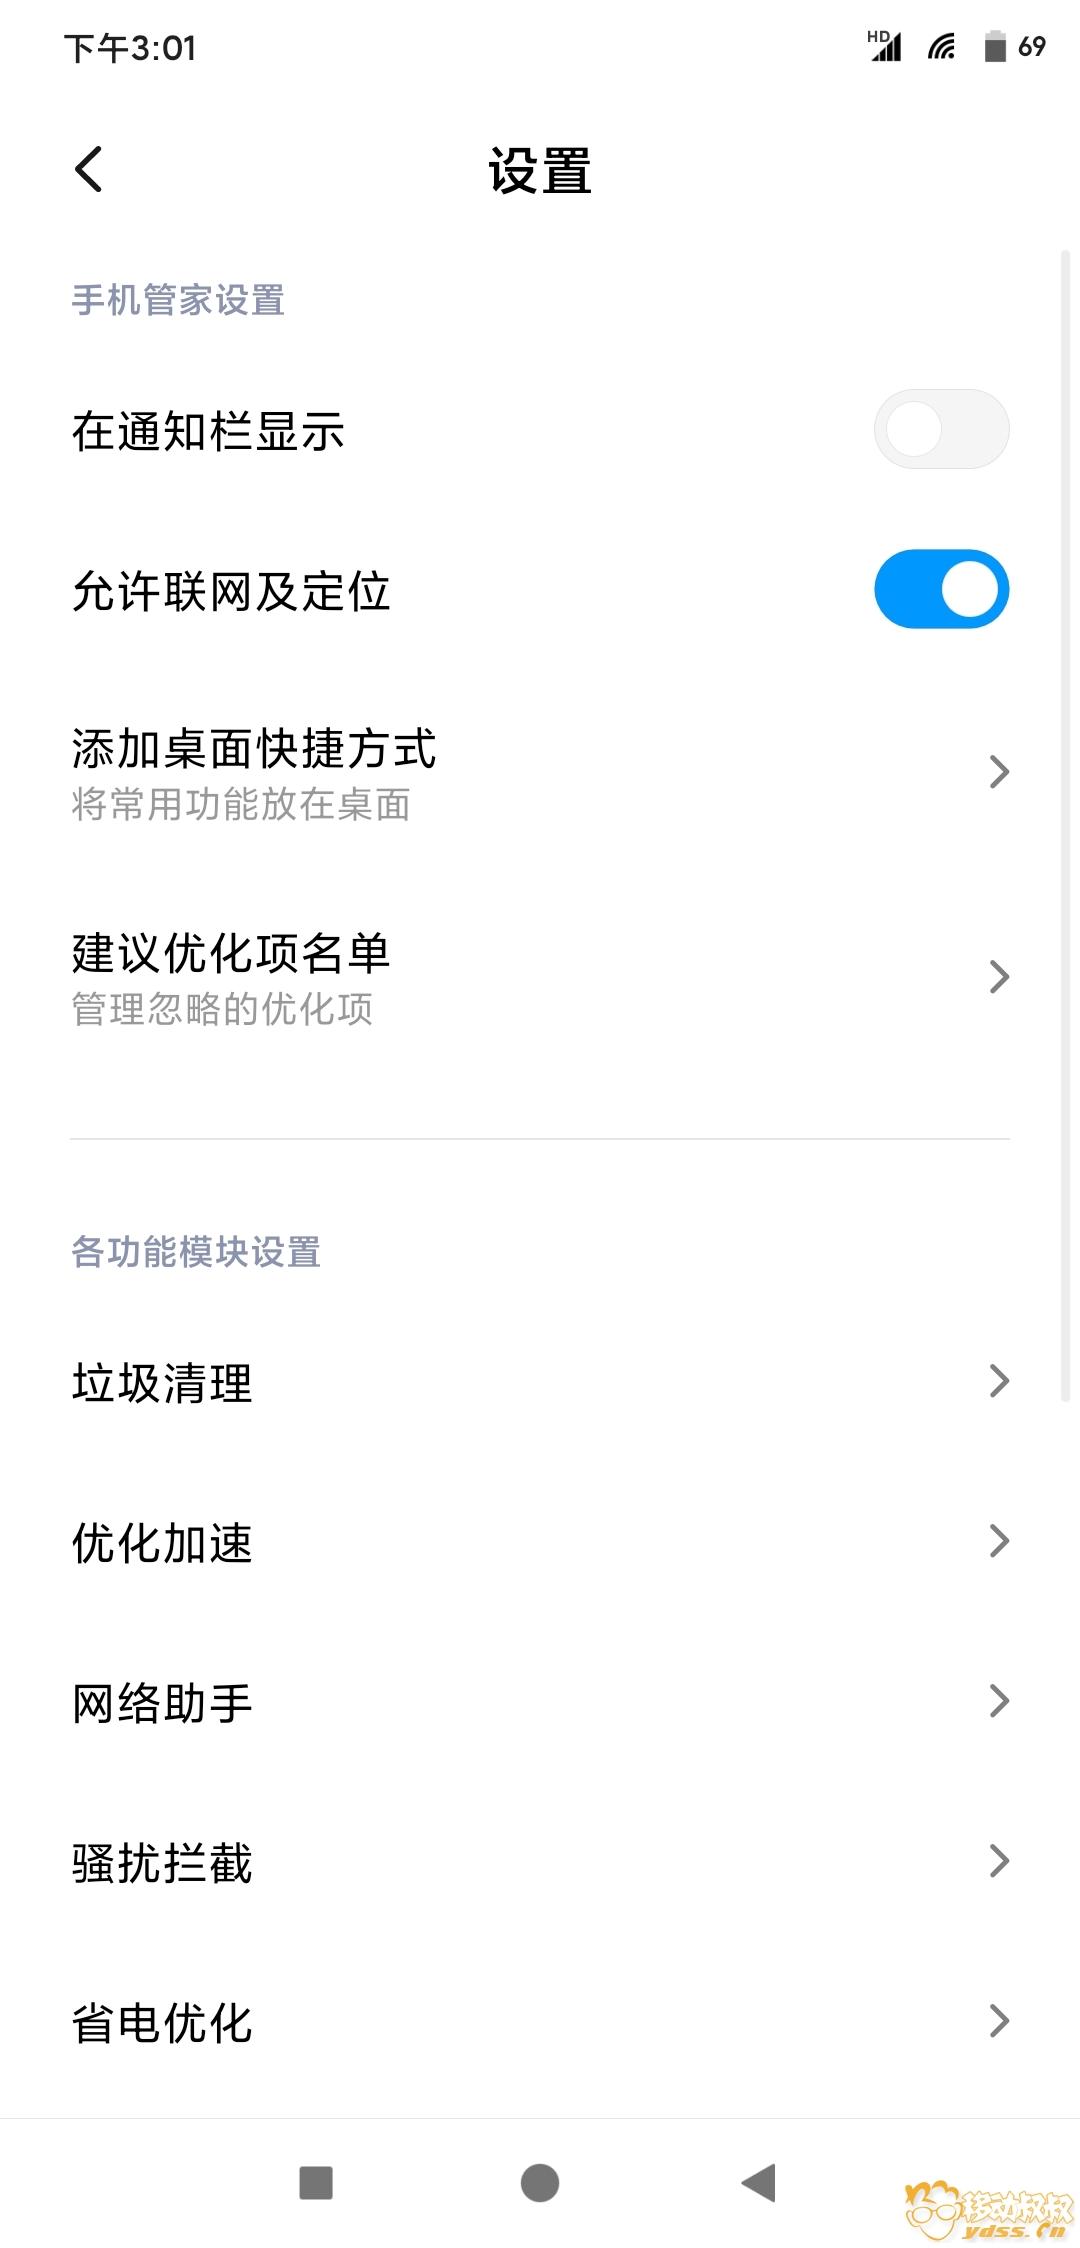 Screenshot_2020-02-11-15-01-21-181_com.miui.securitycenter.jpg